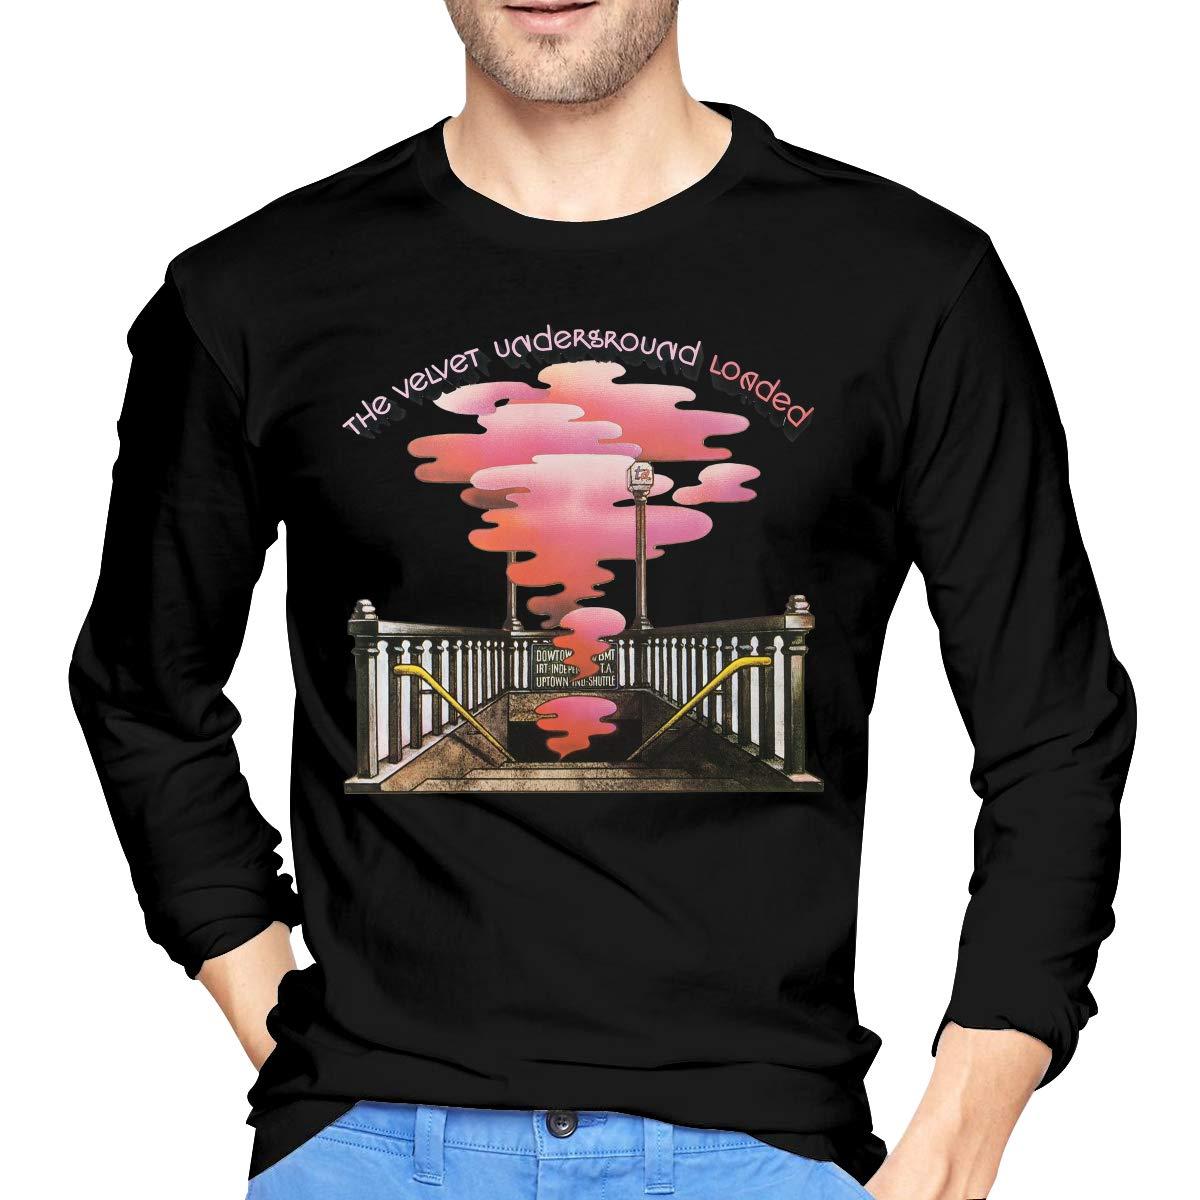 The Velvet Underground S Black Shirts